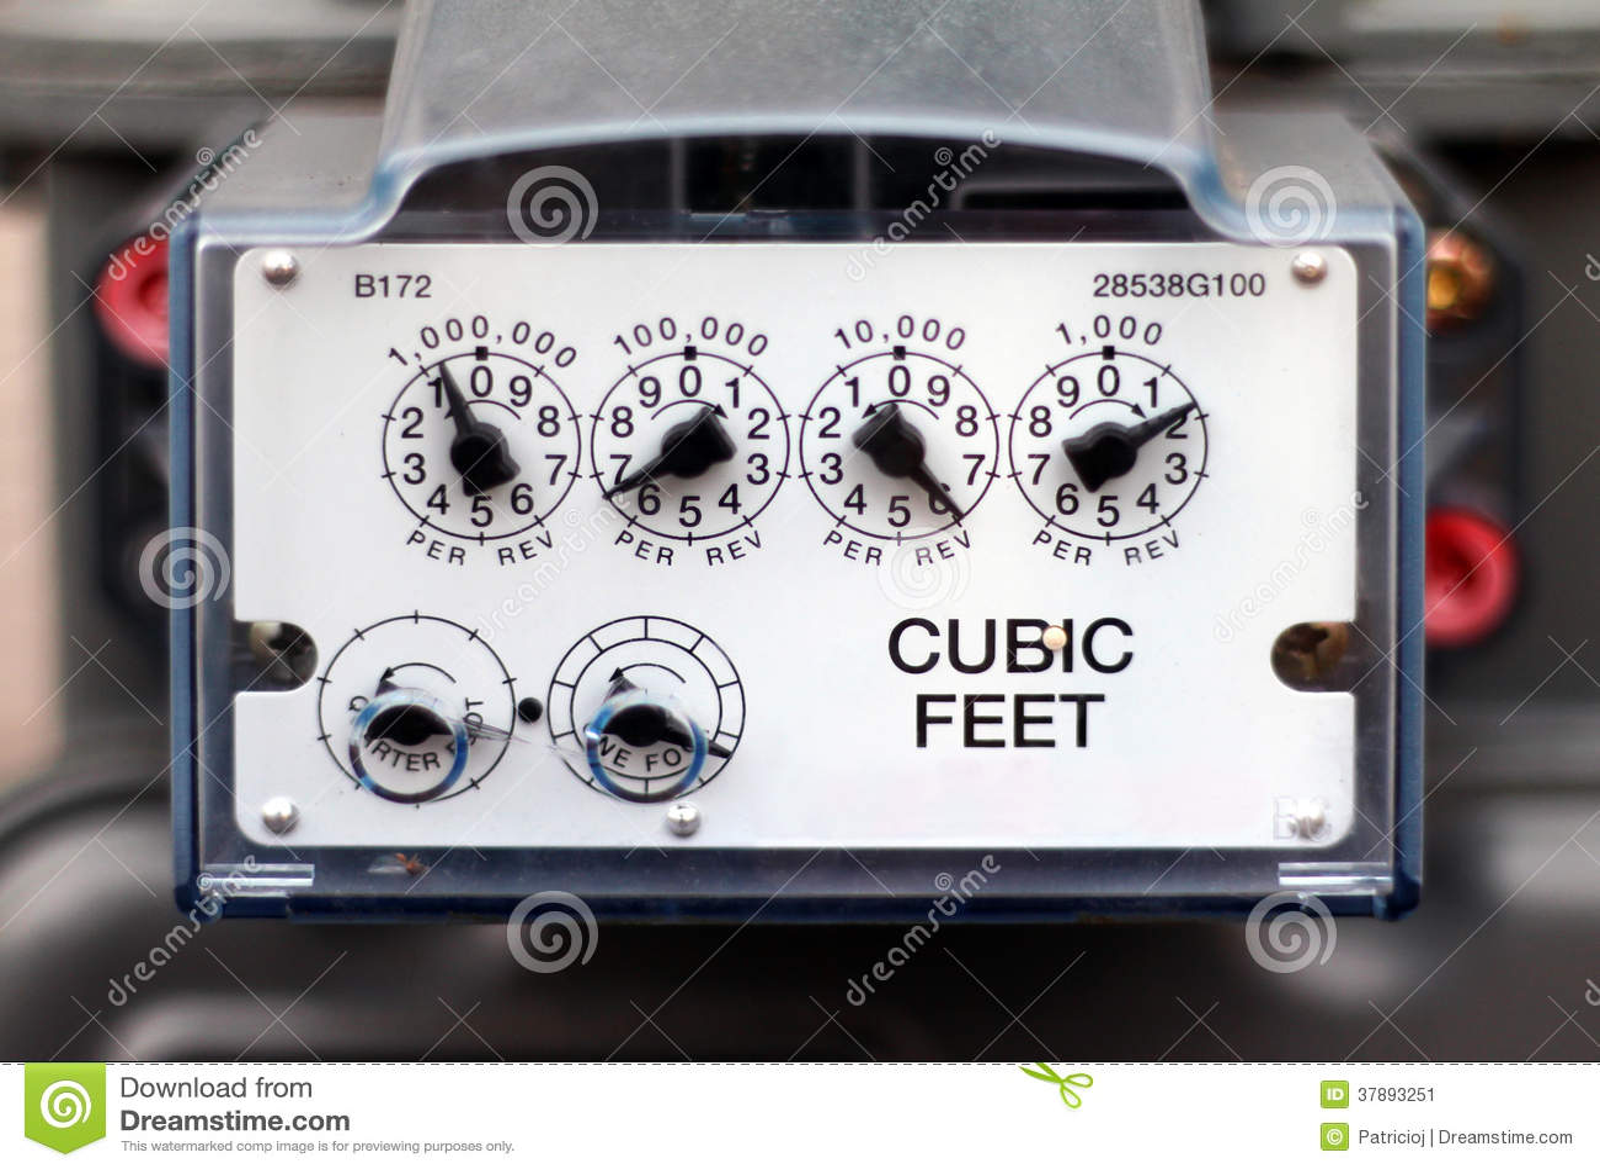 Power Meter Cartoon : Electric meter stock image cartoondealer